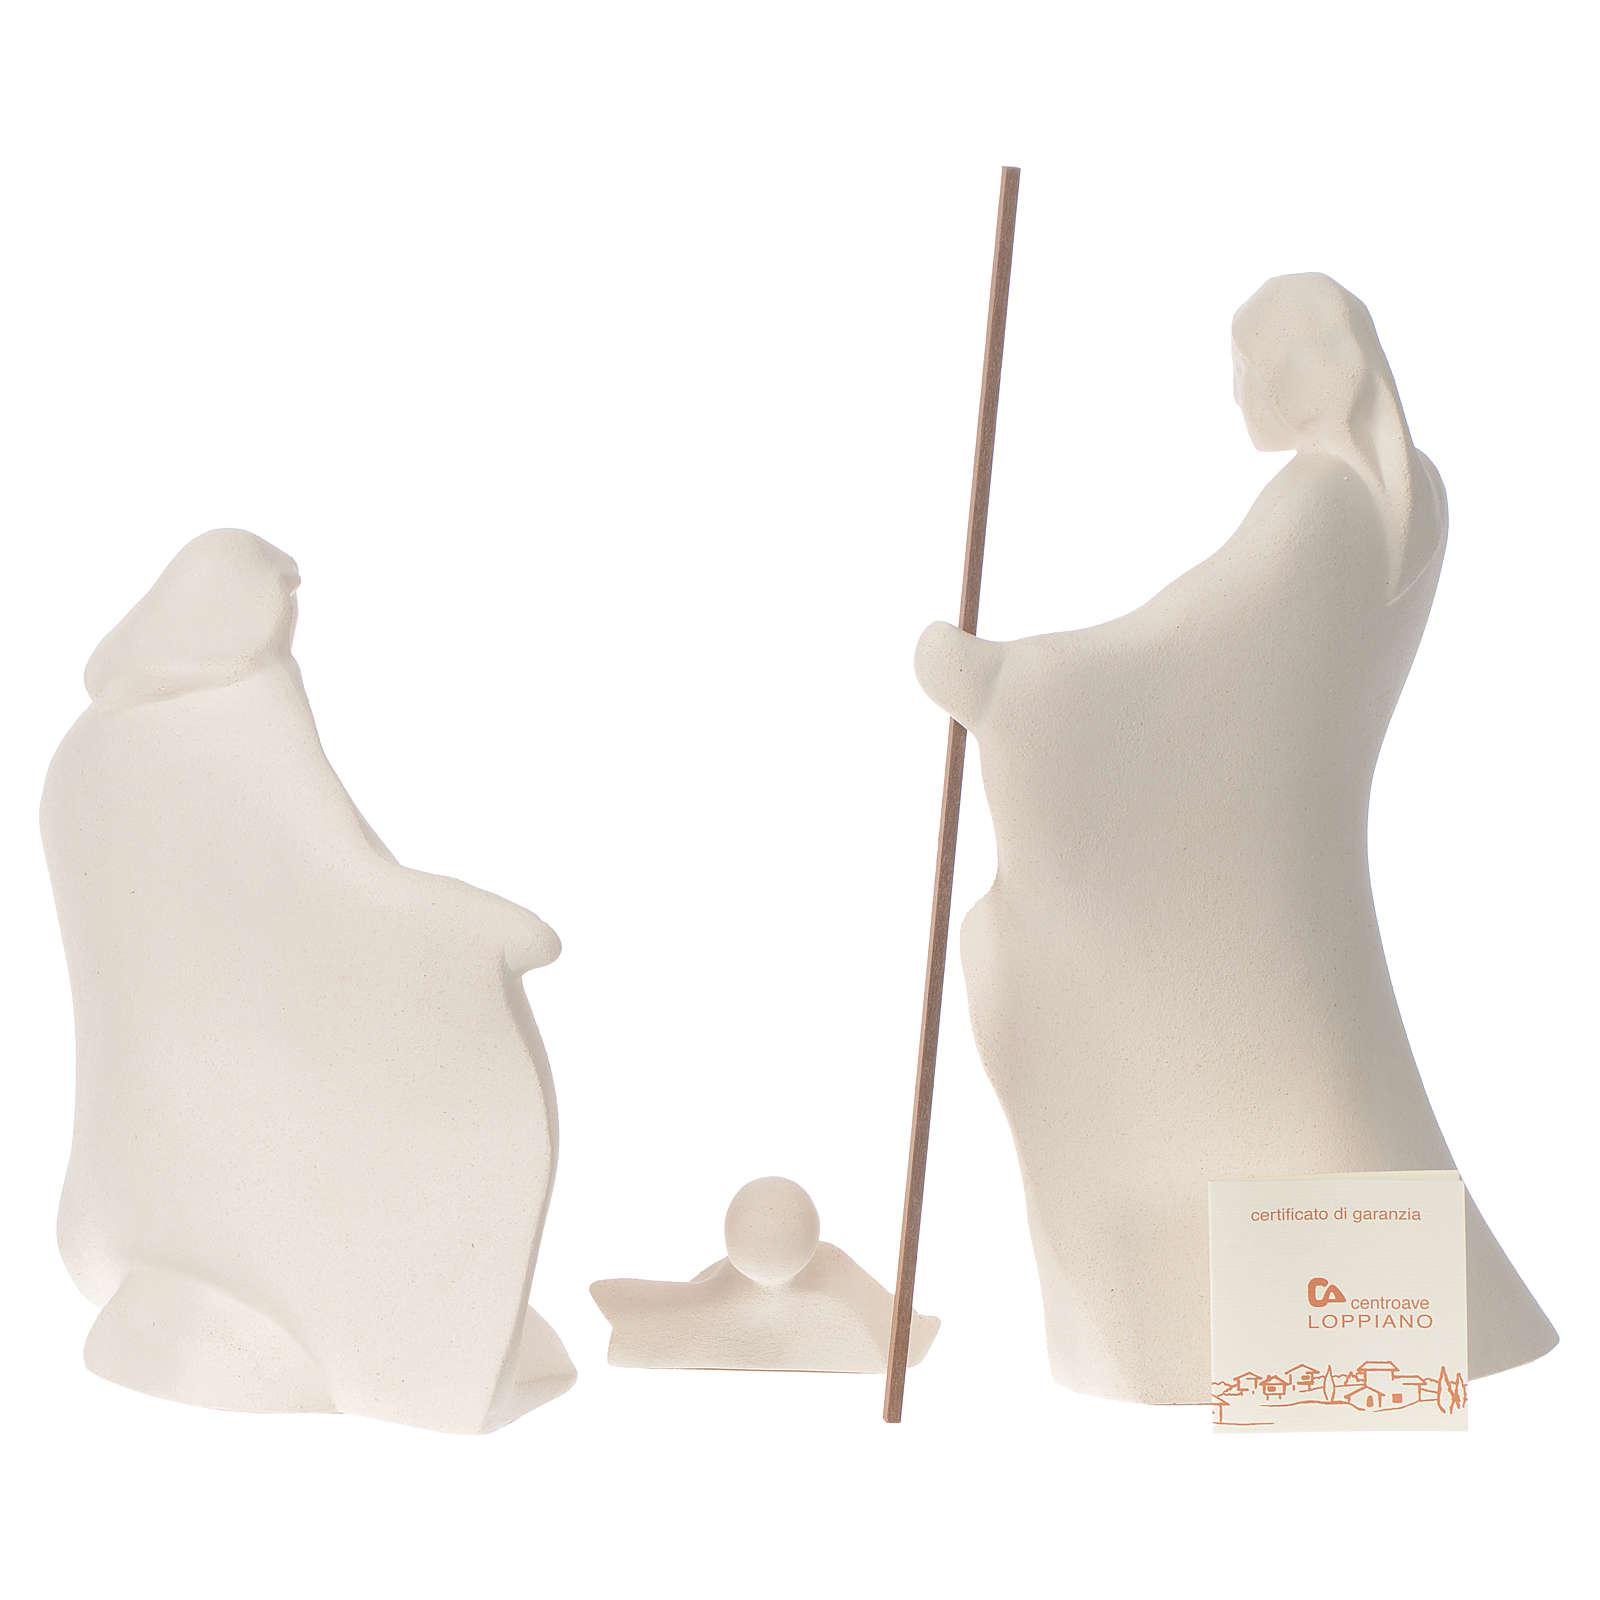 Presepe Giubileo argilla Centro Ave 22 cm 4